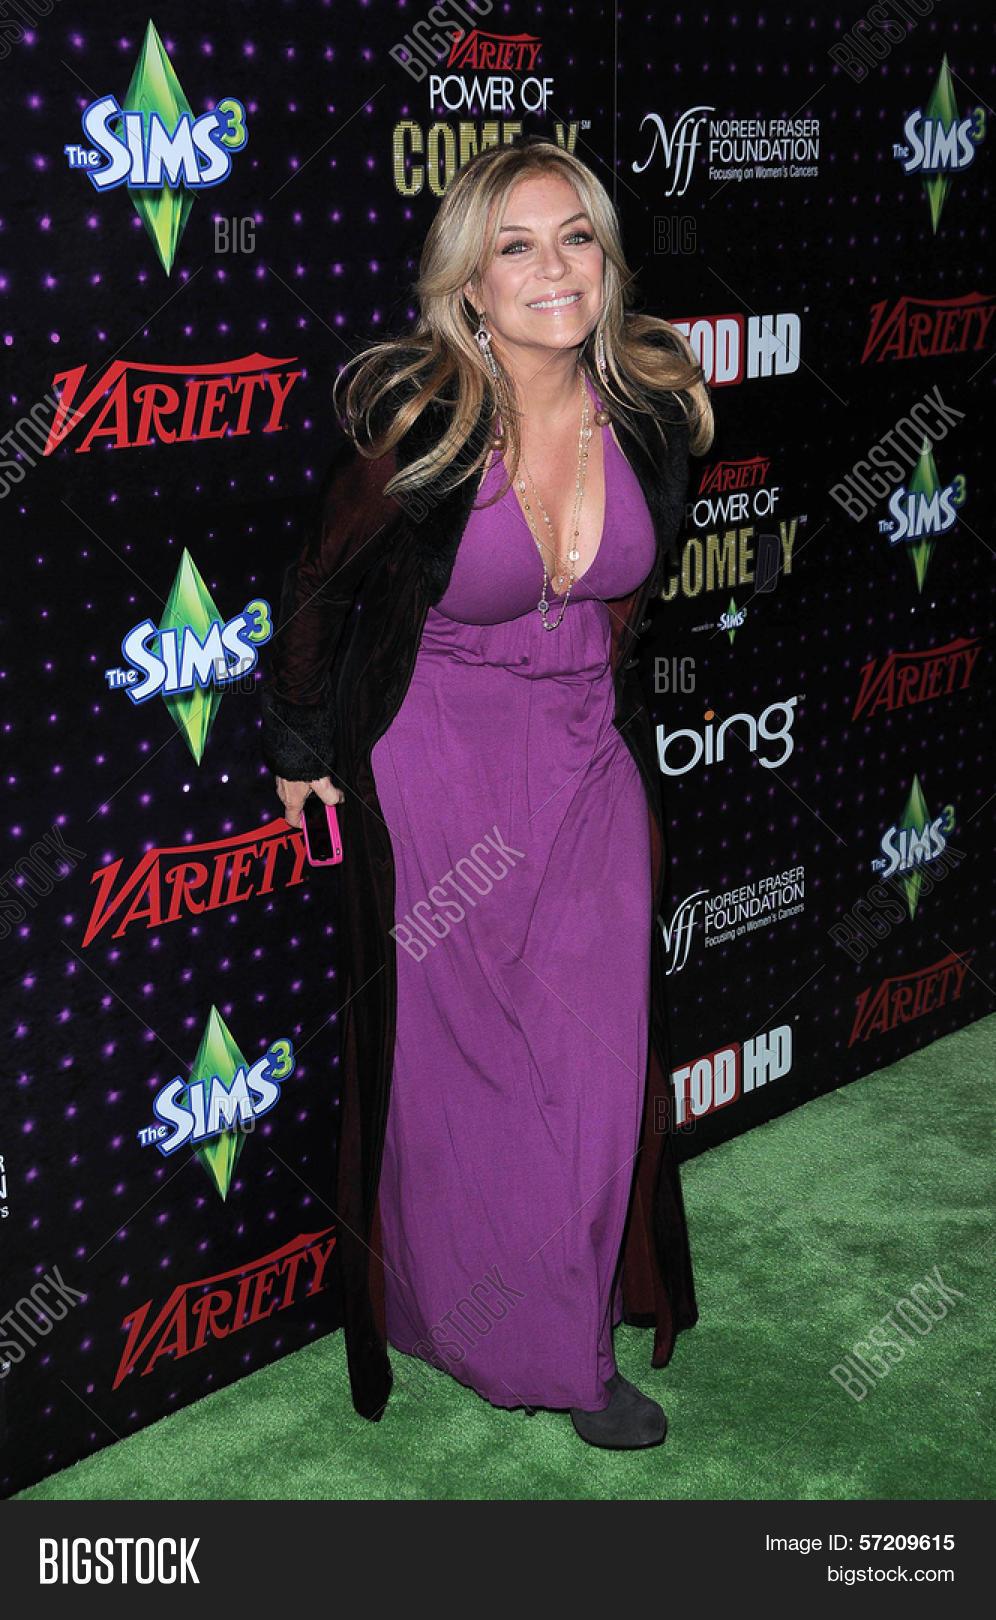 Mara Corday Adult pics & movies Laraine Stephens,Selena Gomez